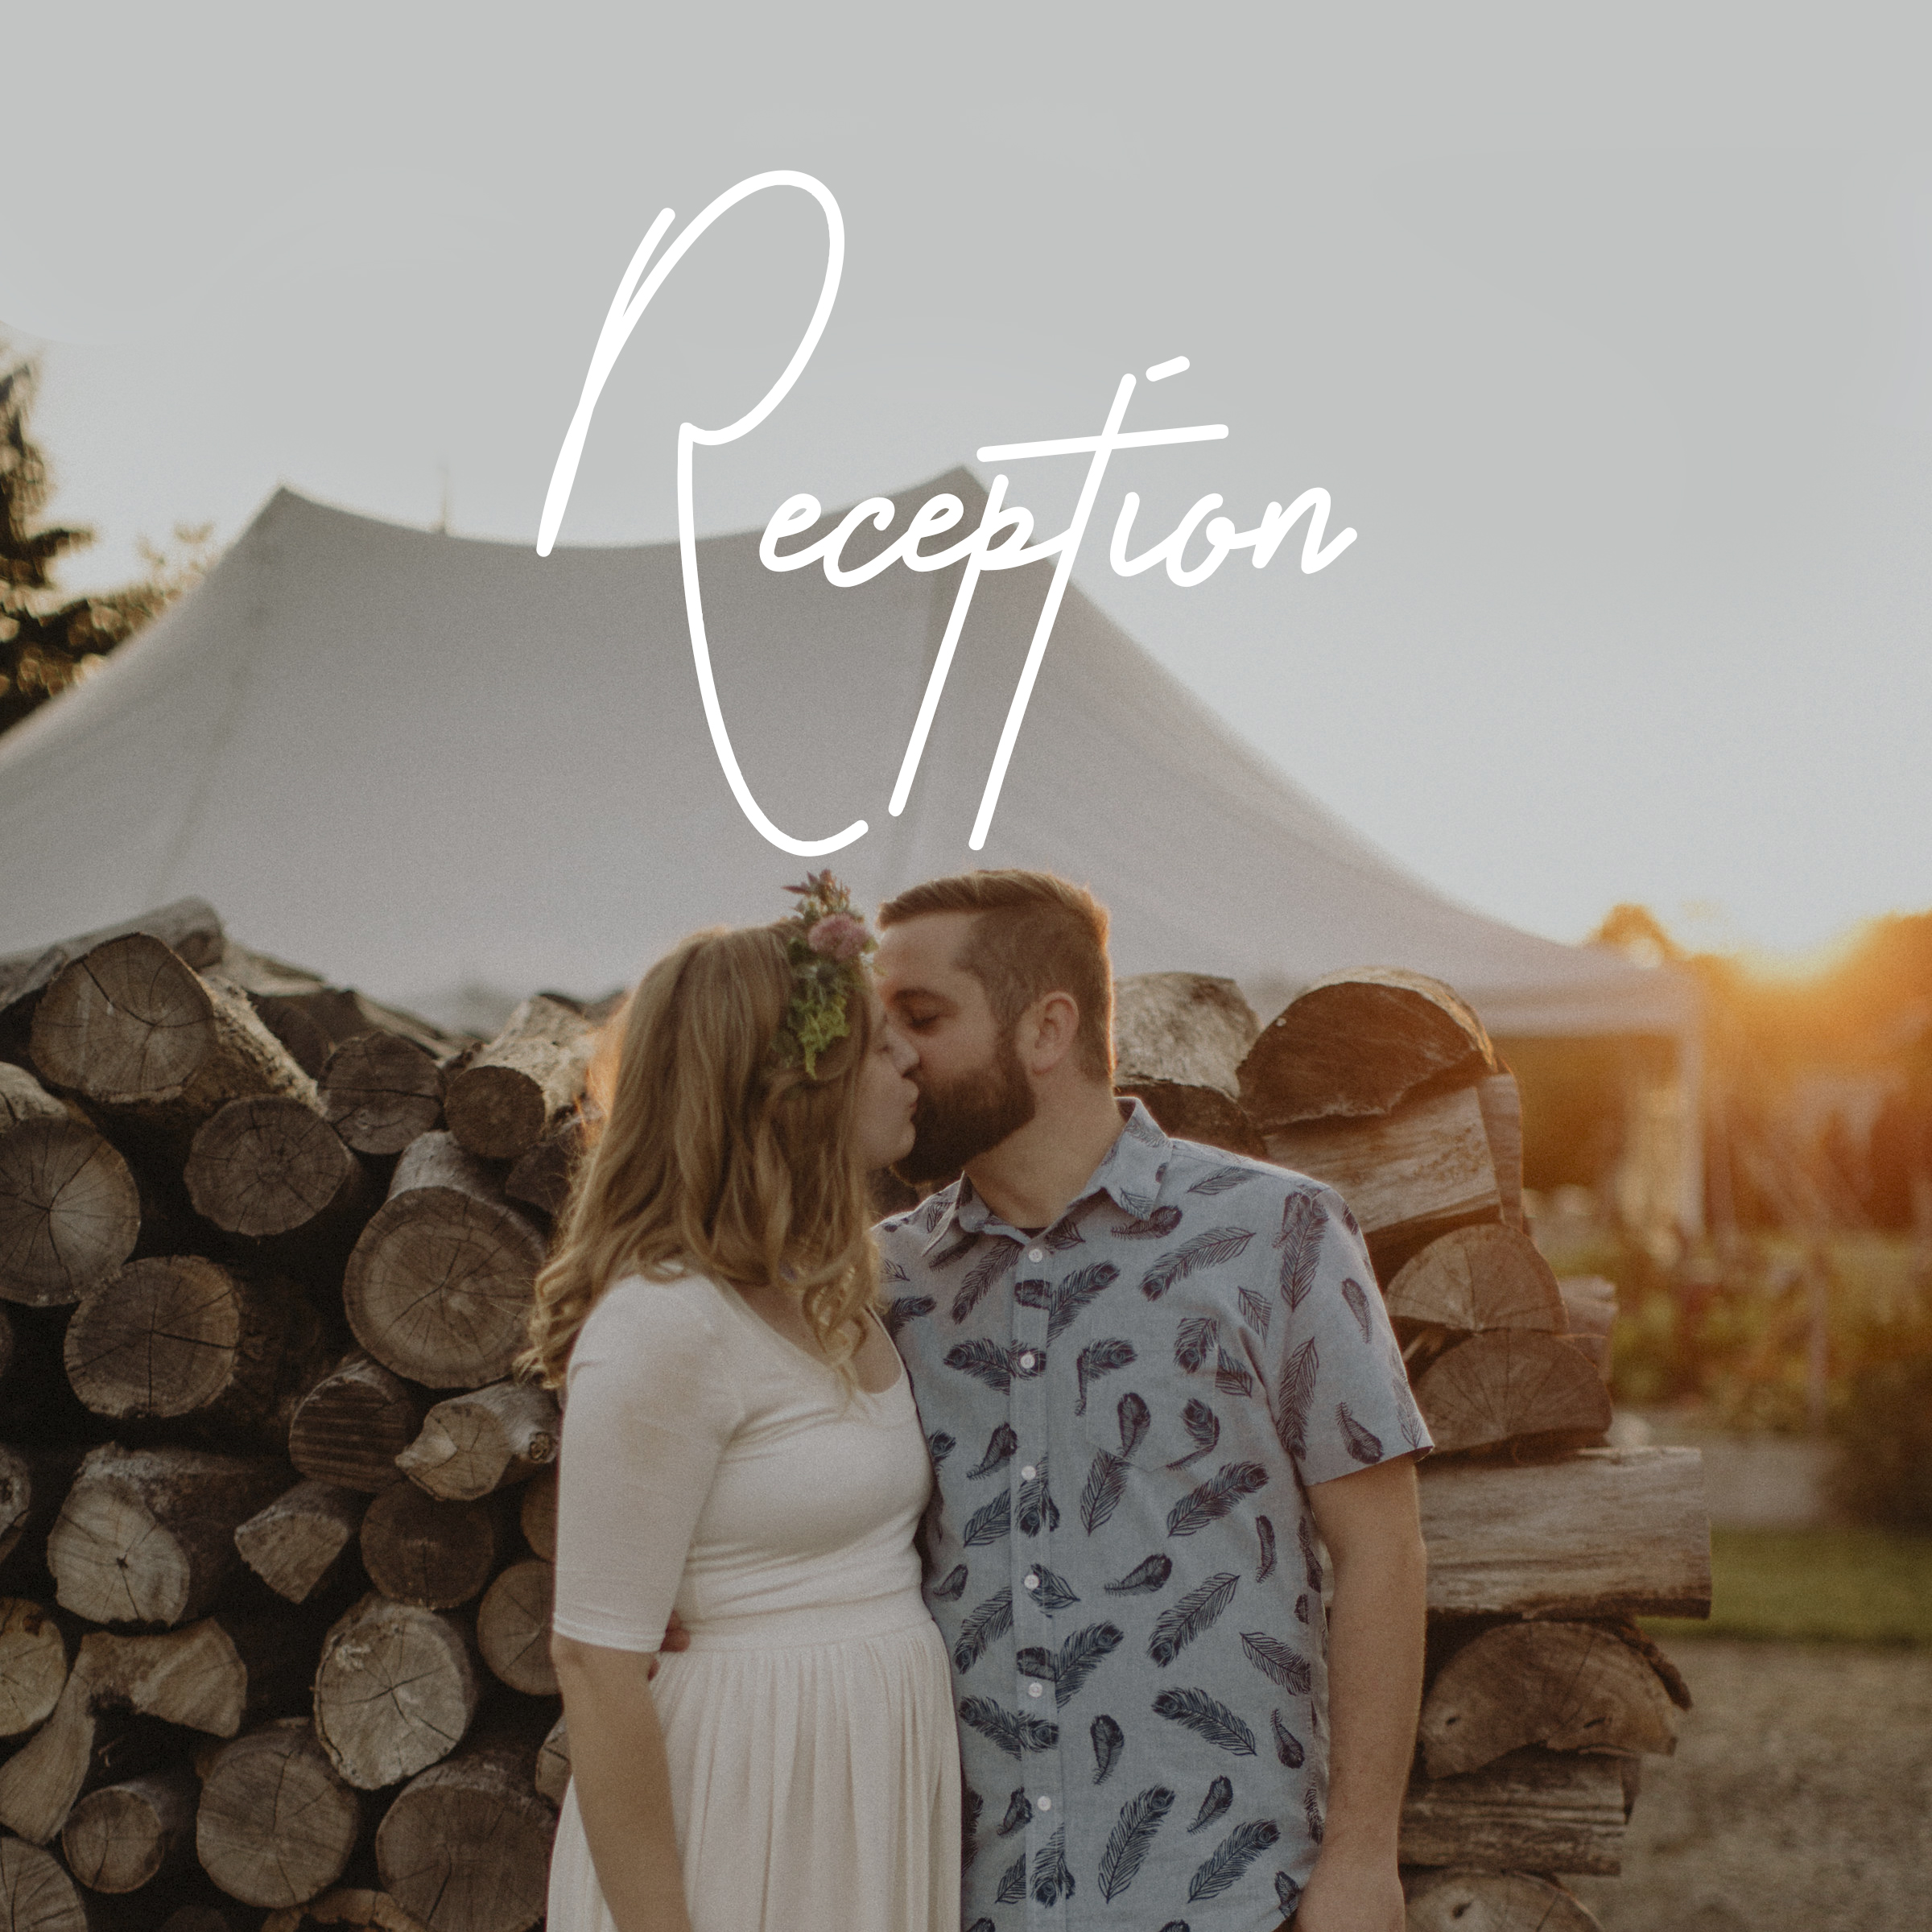 Reception-516 copy.jpg